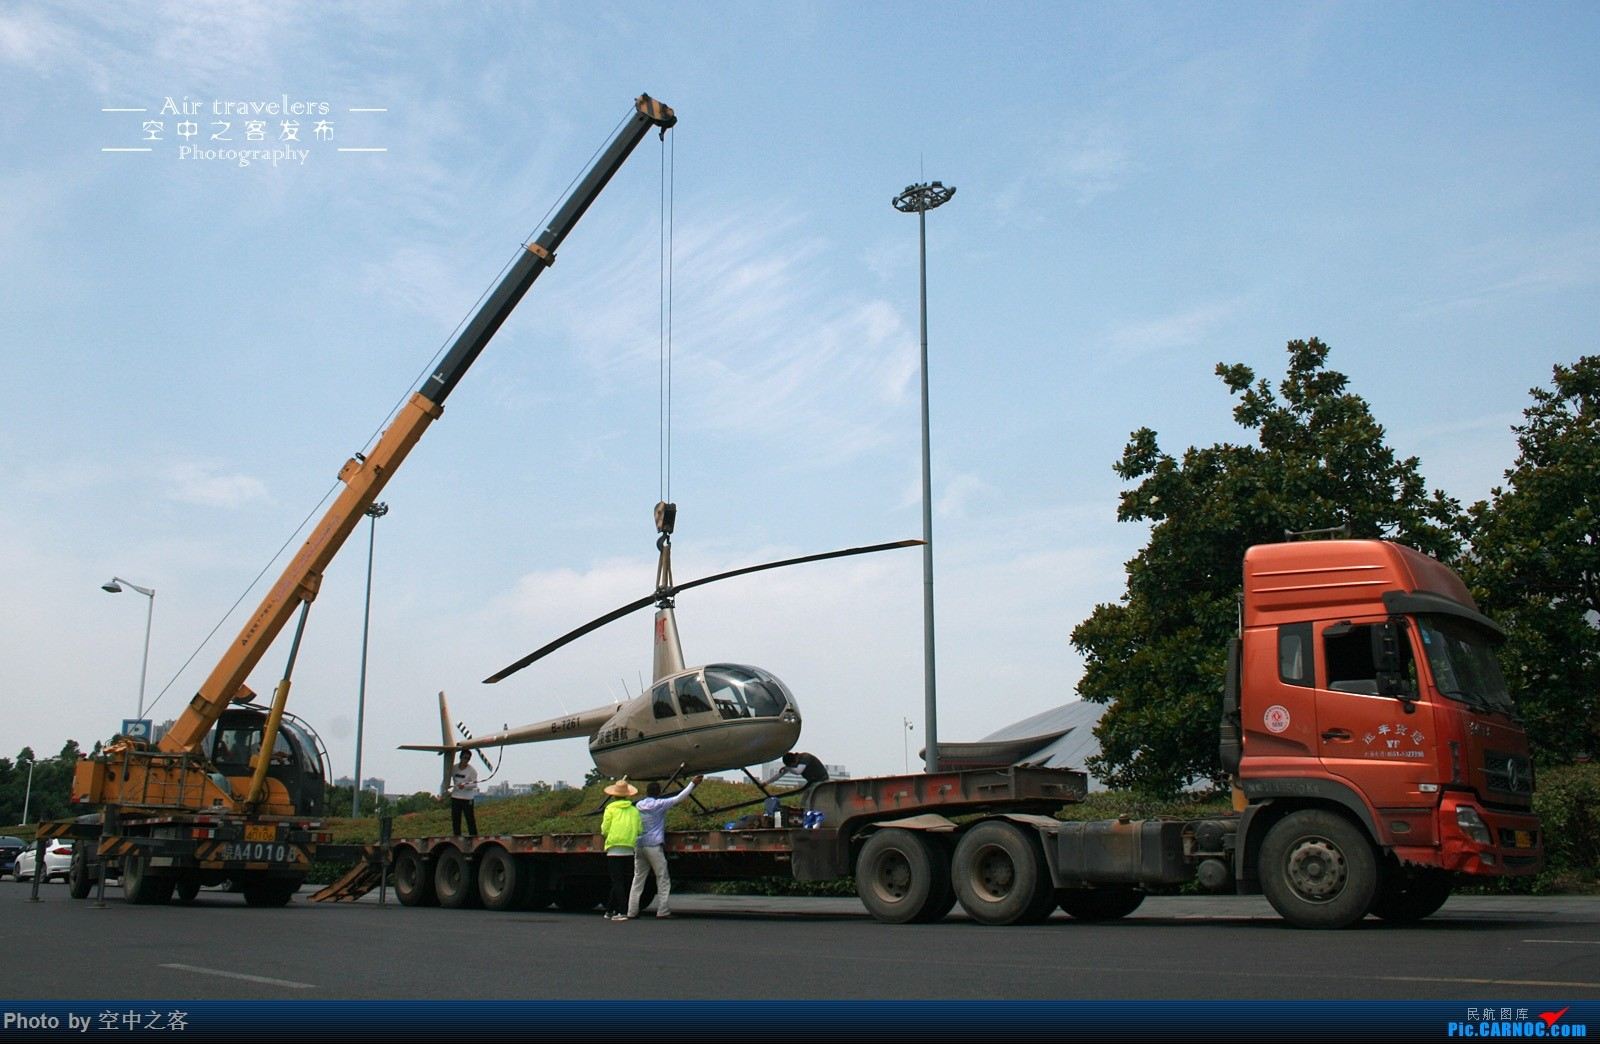 Re:[合肥飞友会-霸都打机队 空中之客发布]搬运顶宏通航R-44直升机[B-7261] ROBINSON R44 II B-7261 合肥市民广场